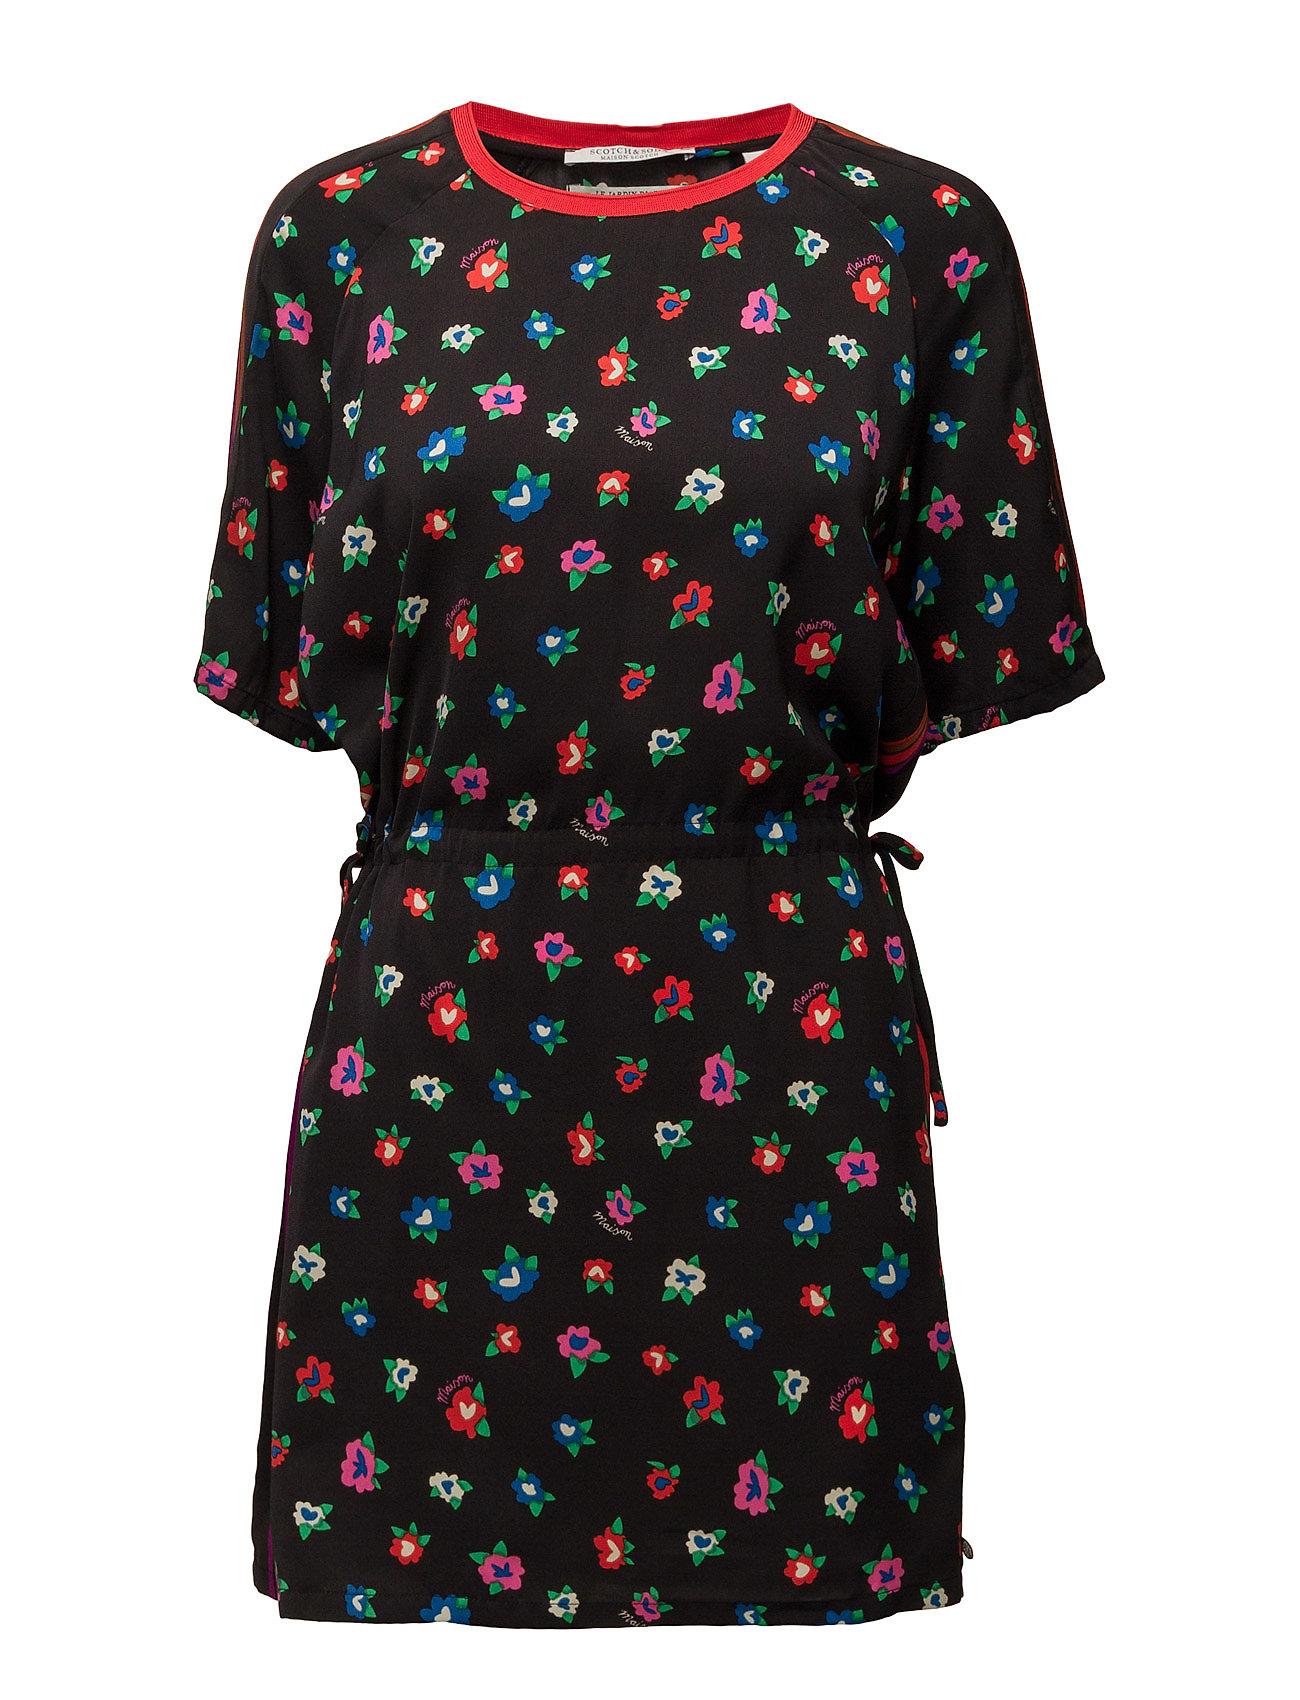 18d61880735625 Silky Feel Dress With Placement Prints And Tie Detail Scotch   Soda Korte  kjoler til Damer